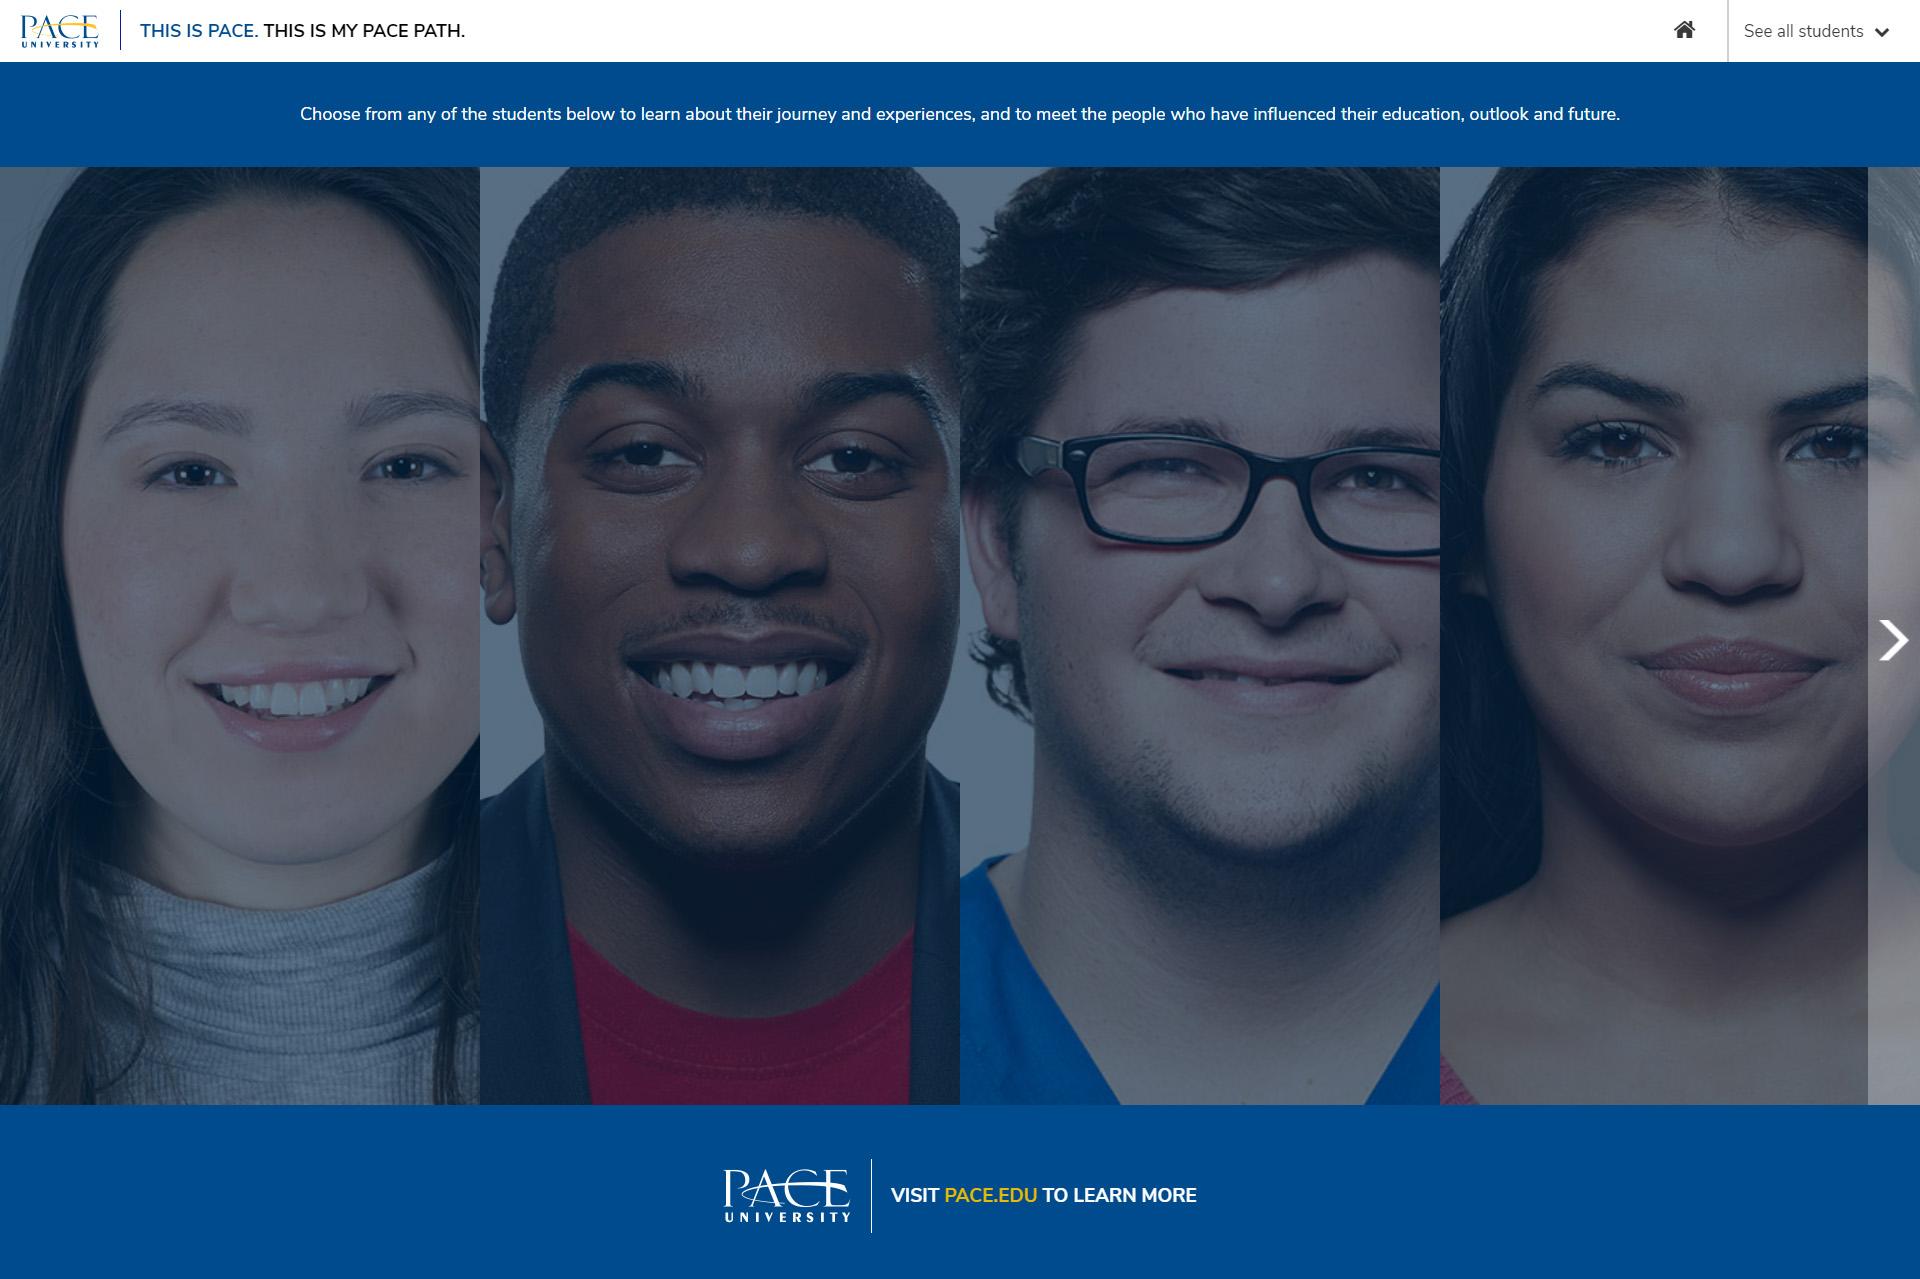 Previous University Website Design Example